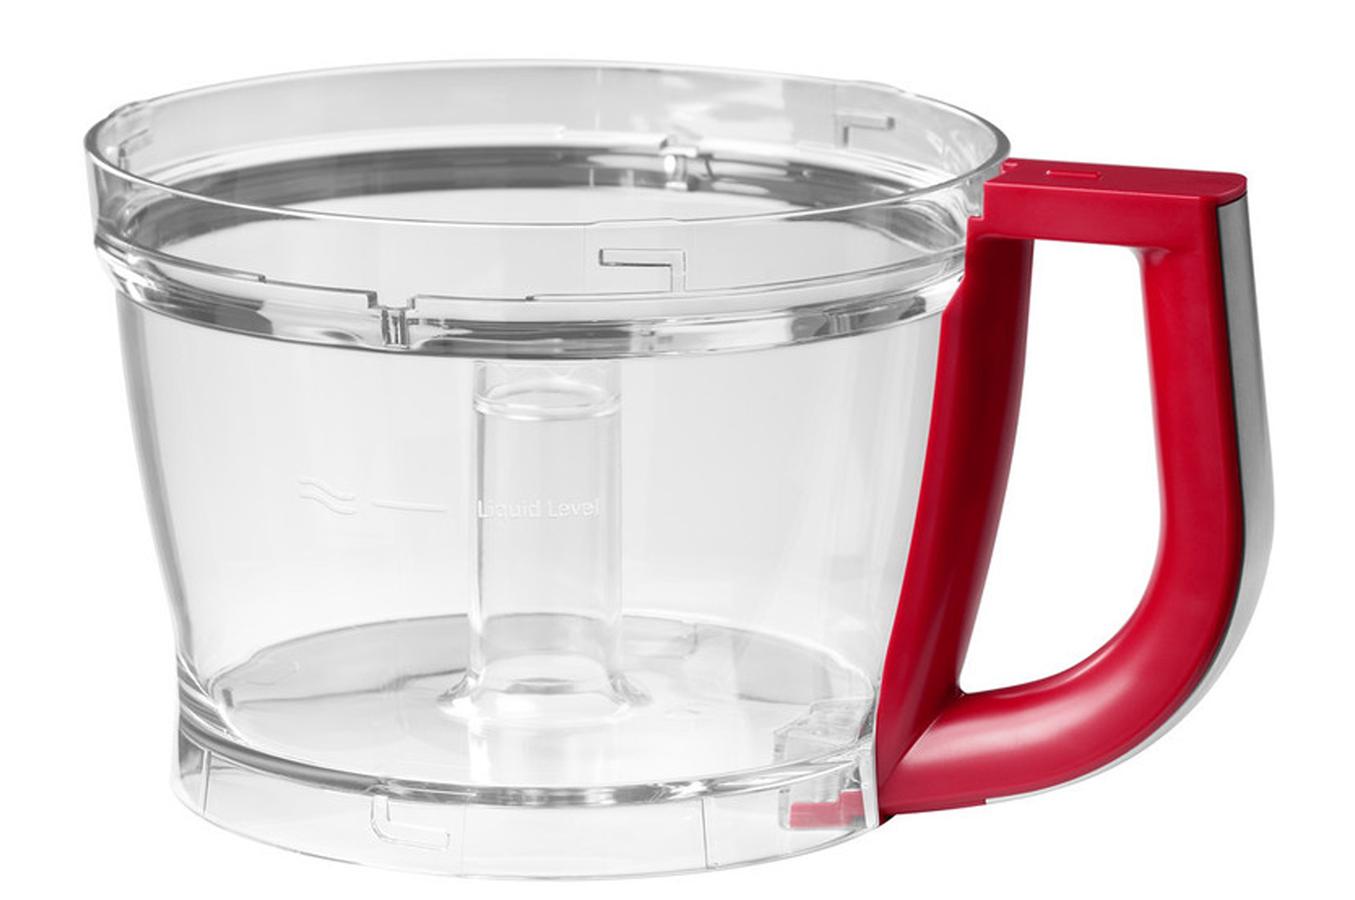 Robot multifonction kitchenaid 5kfp1335eer 4045203 for Robot cuisine kitchenaid